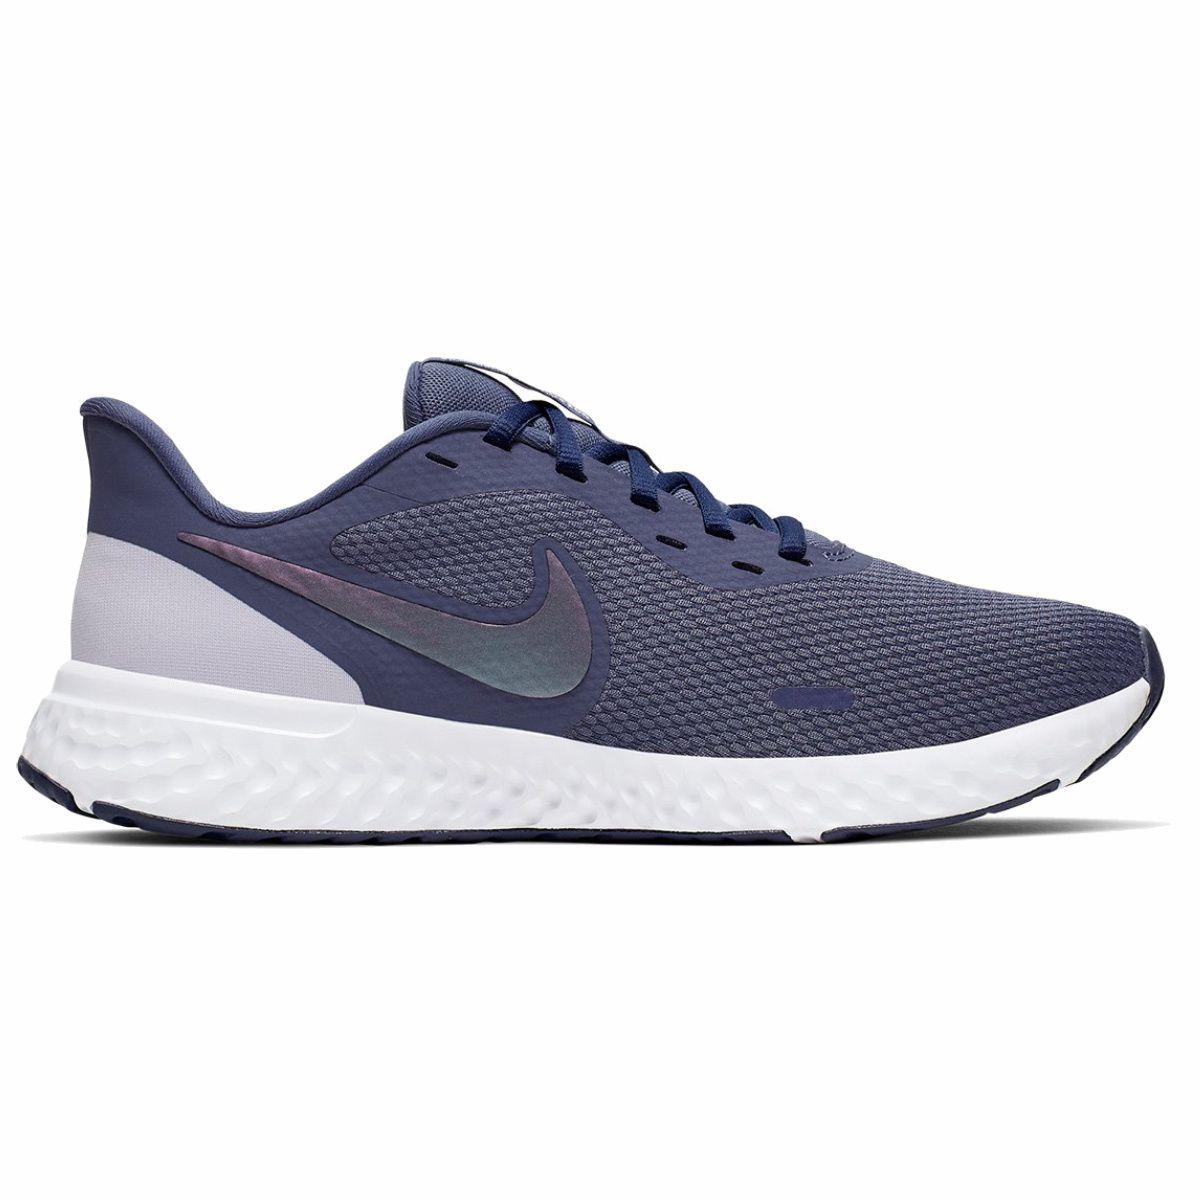 Tenis Nike Downshifter 7 Azul Feminino